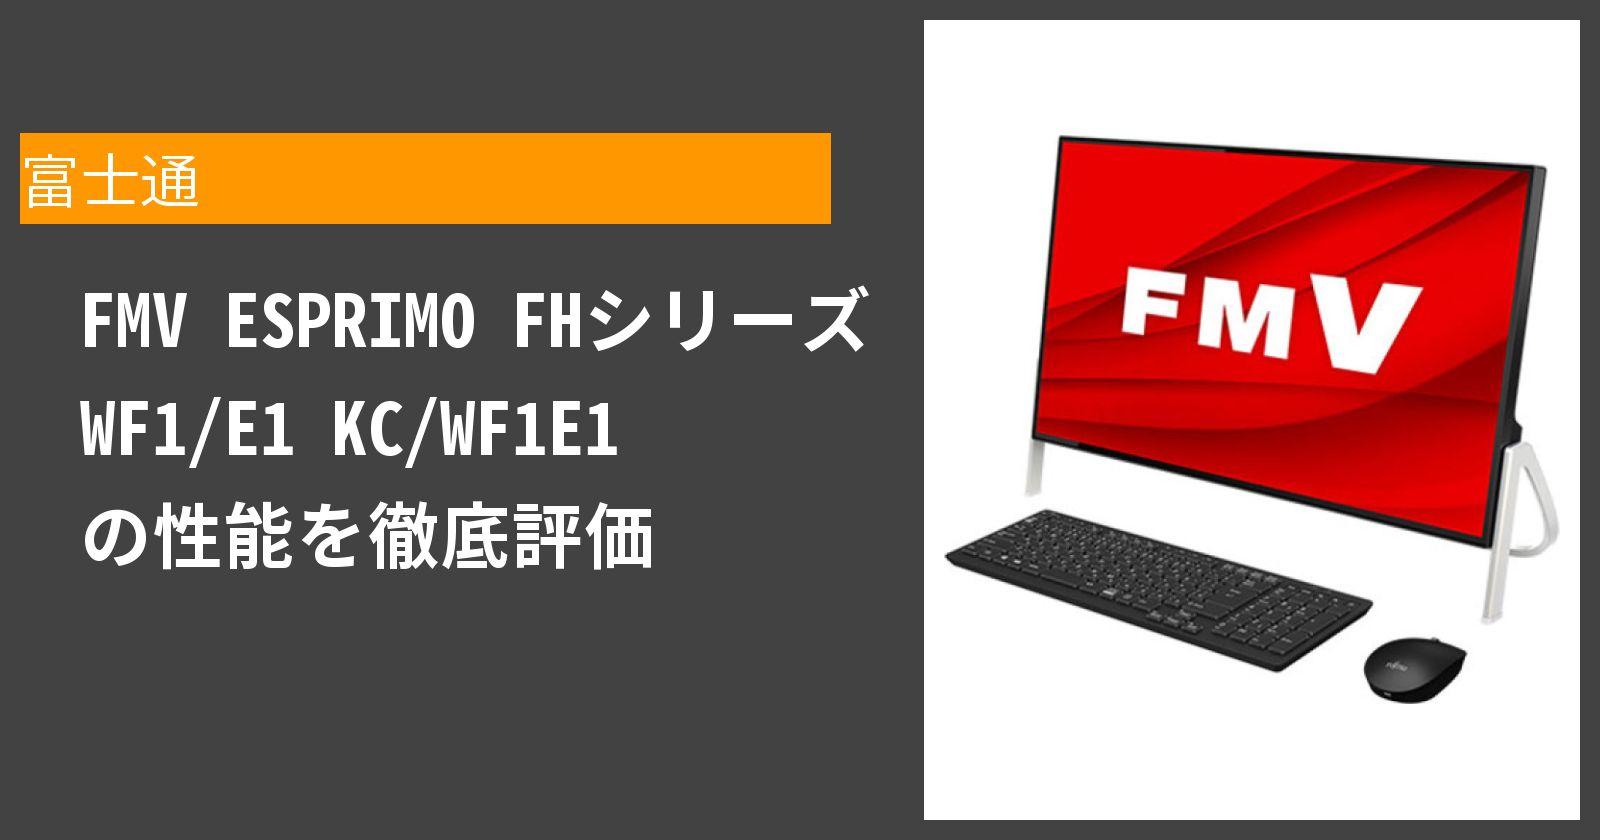 FMV ESPRIMO FHシリーズ WF1/E1 KC/WF1E1 の性能を徹底評価